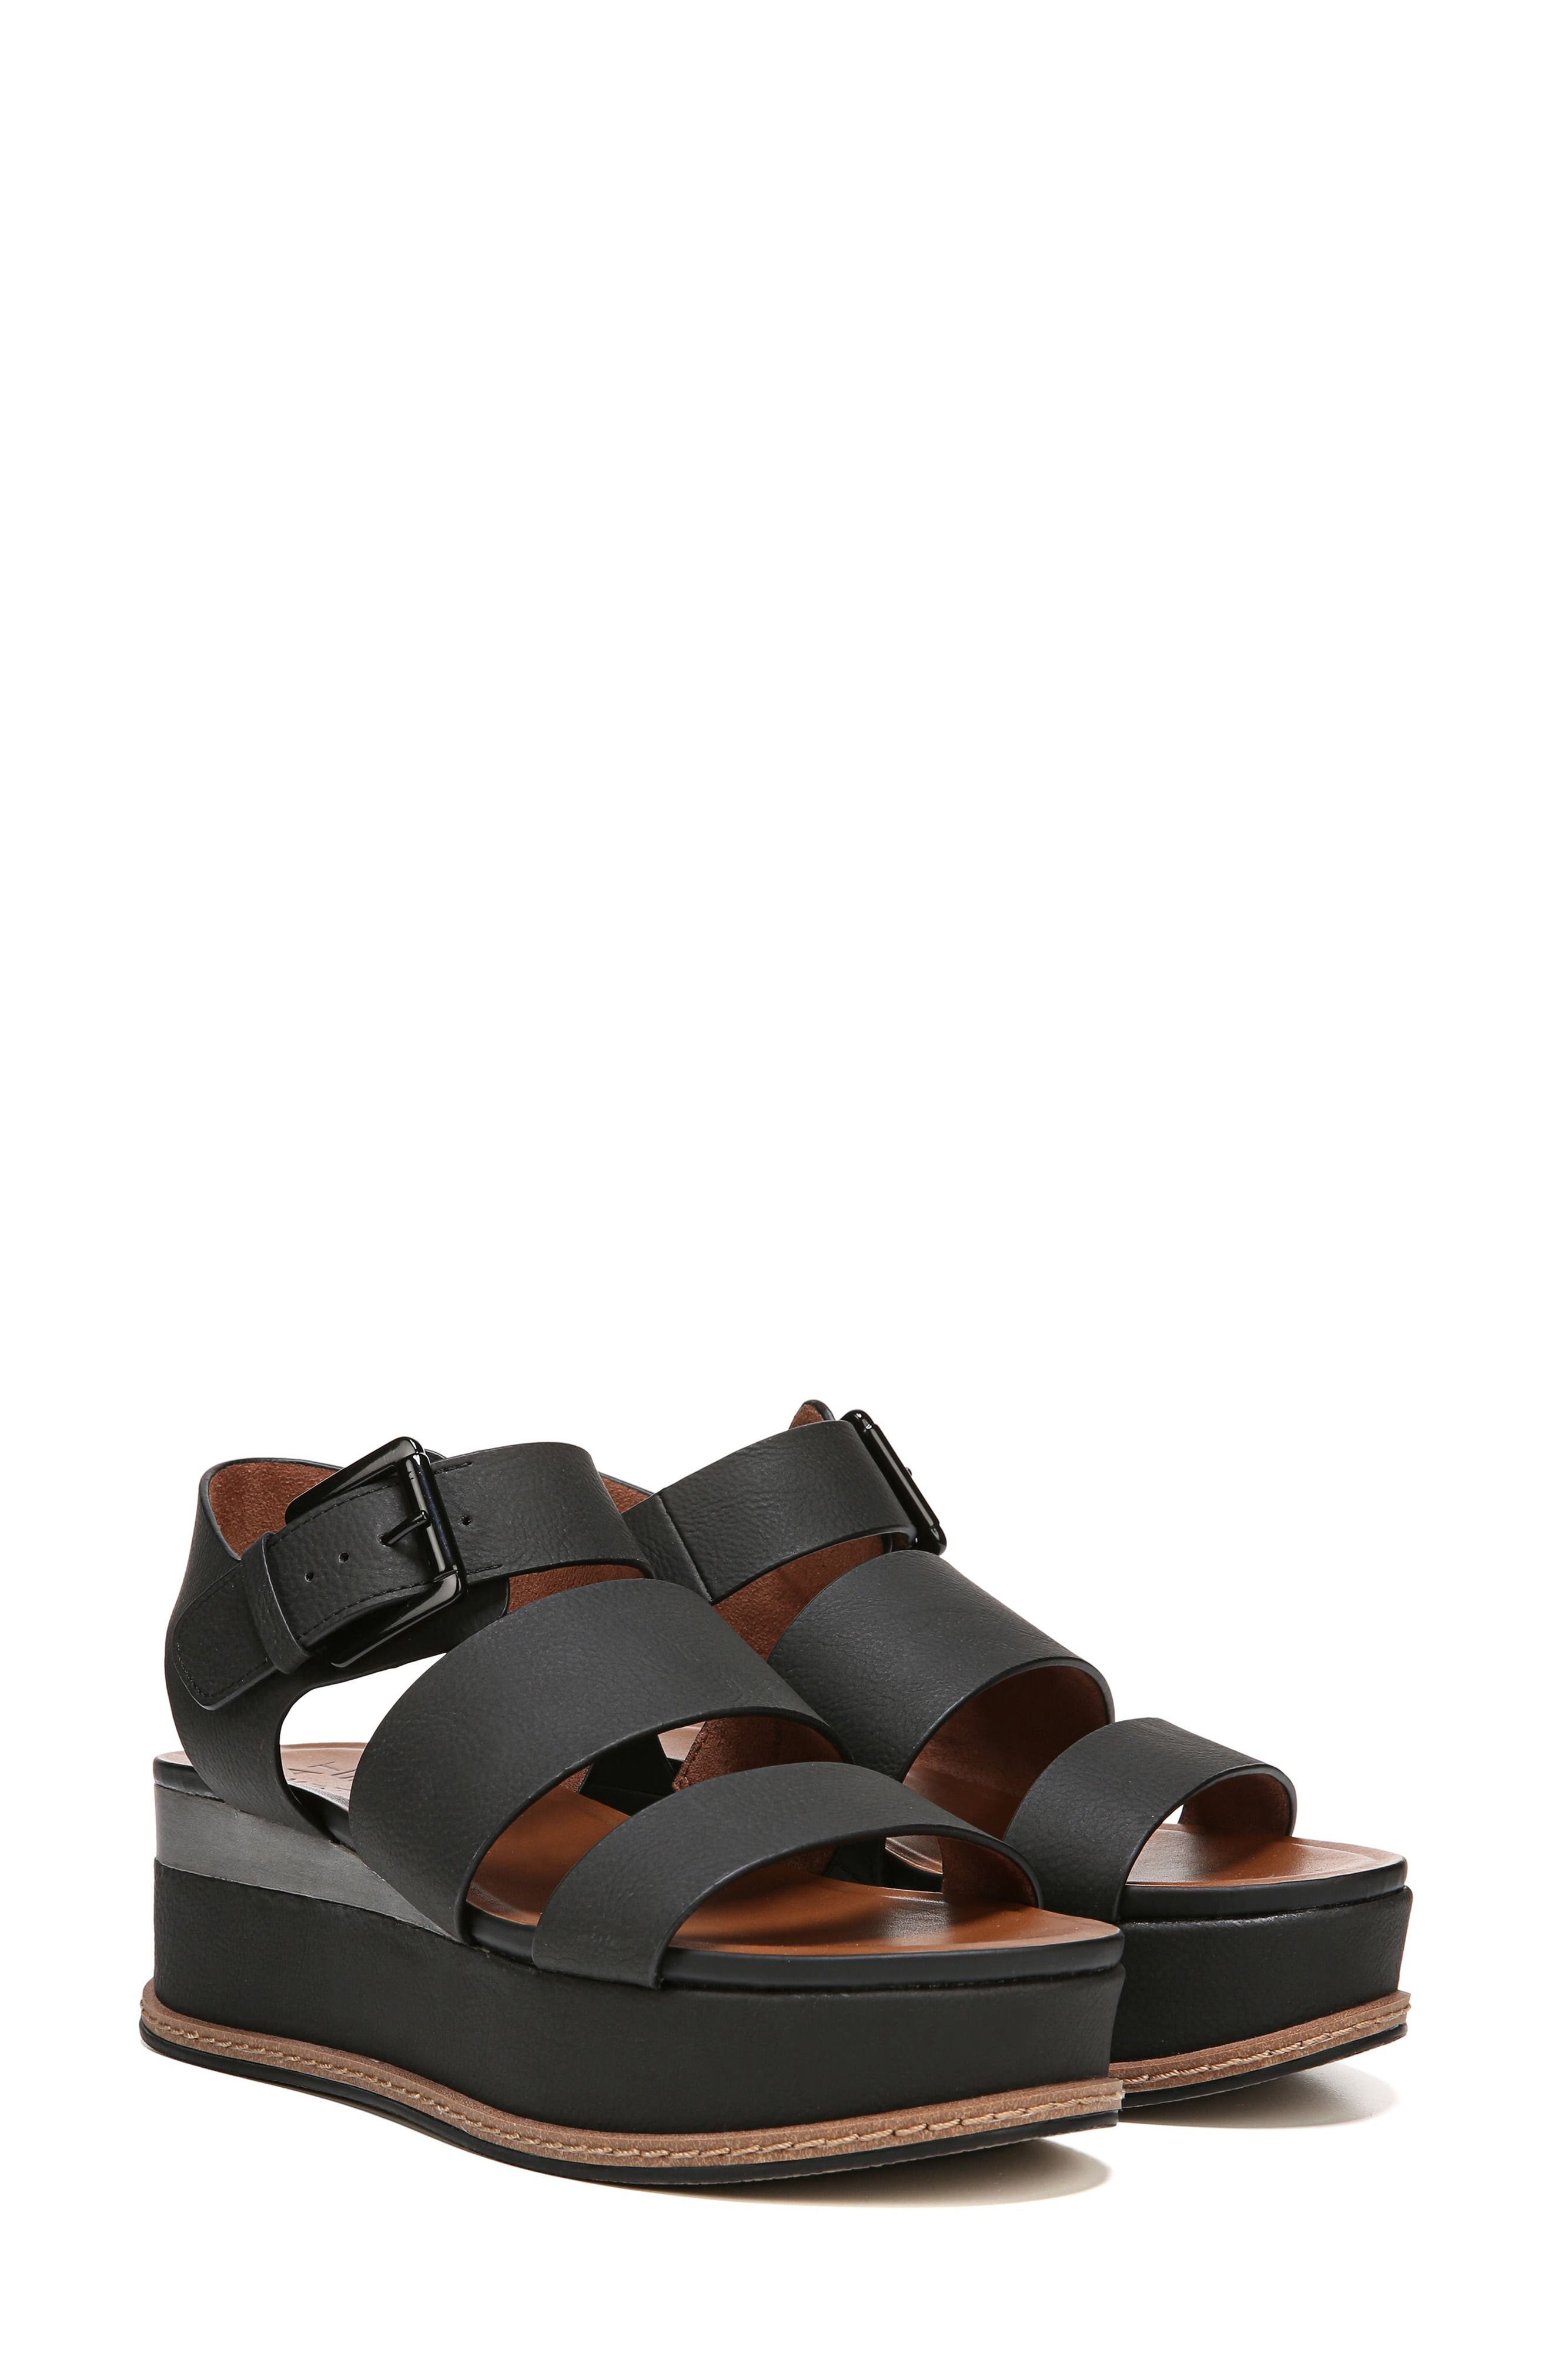 NATURALIZER, Billie Platform Sandal, Alternate thumbnail 8, color, BLACK FAUX NUBUCK LEATHER